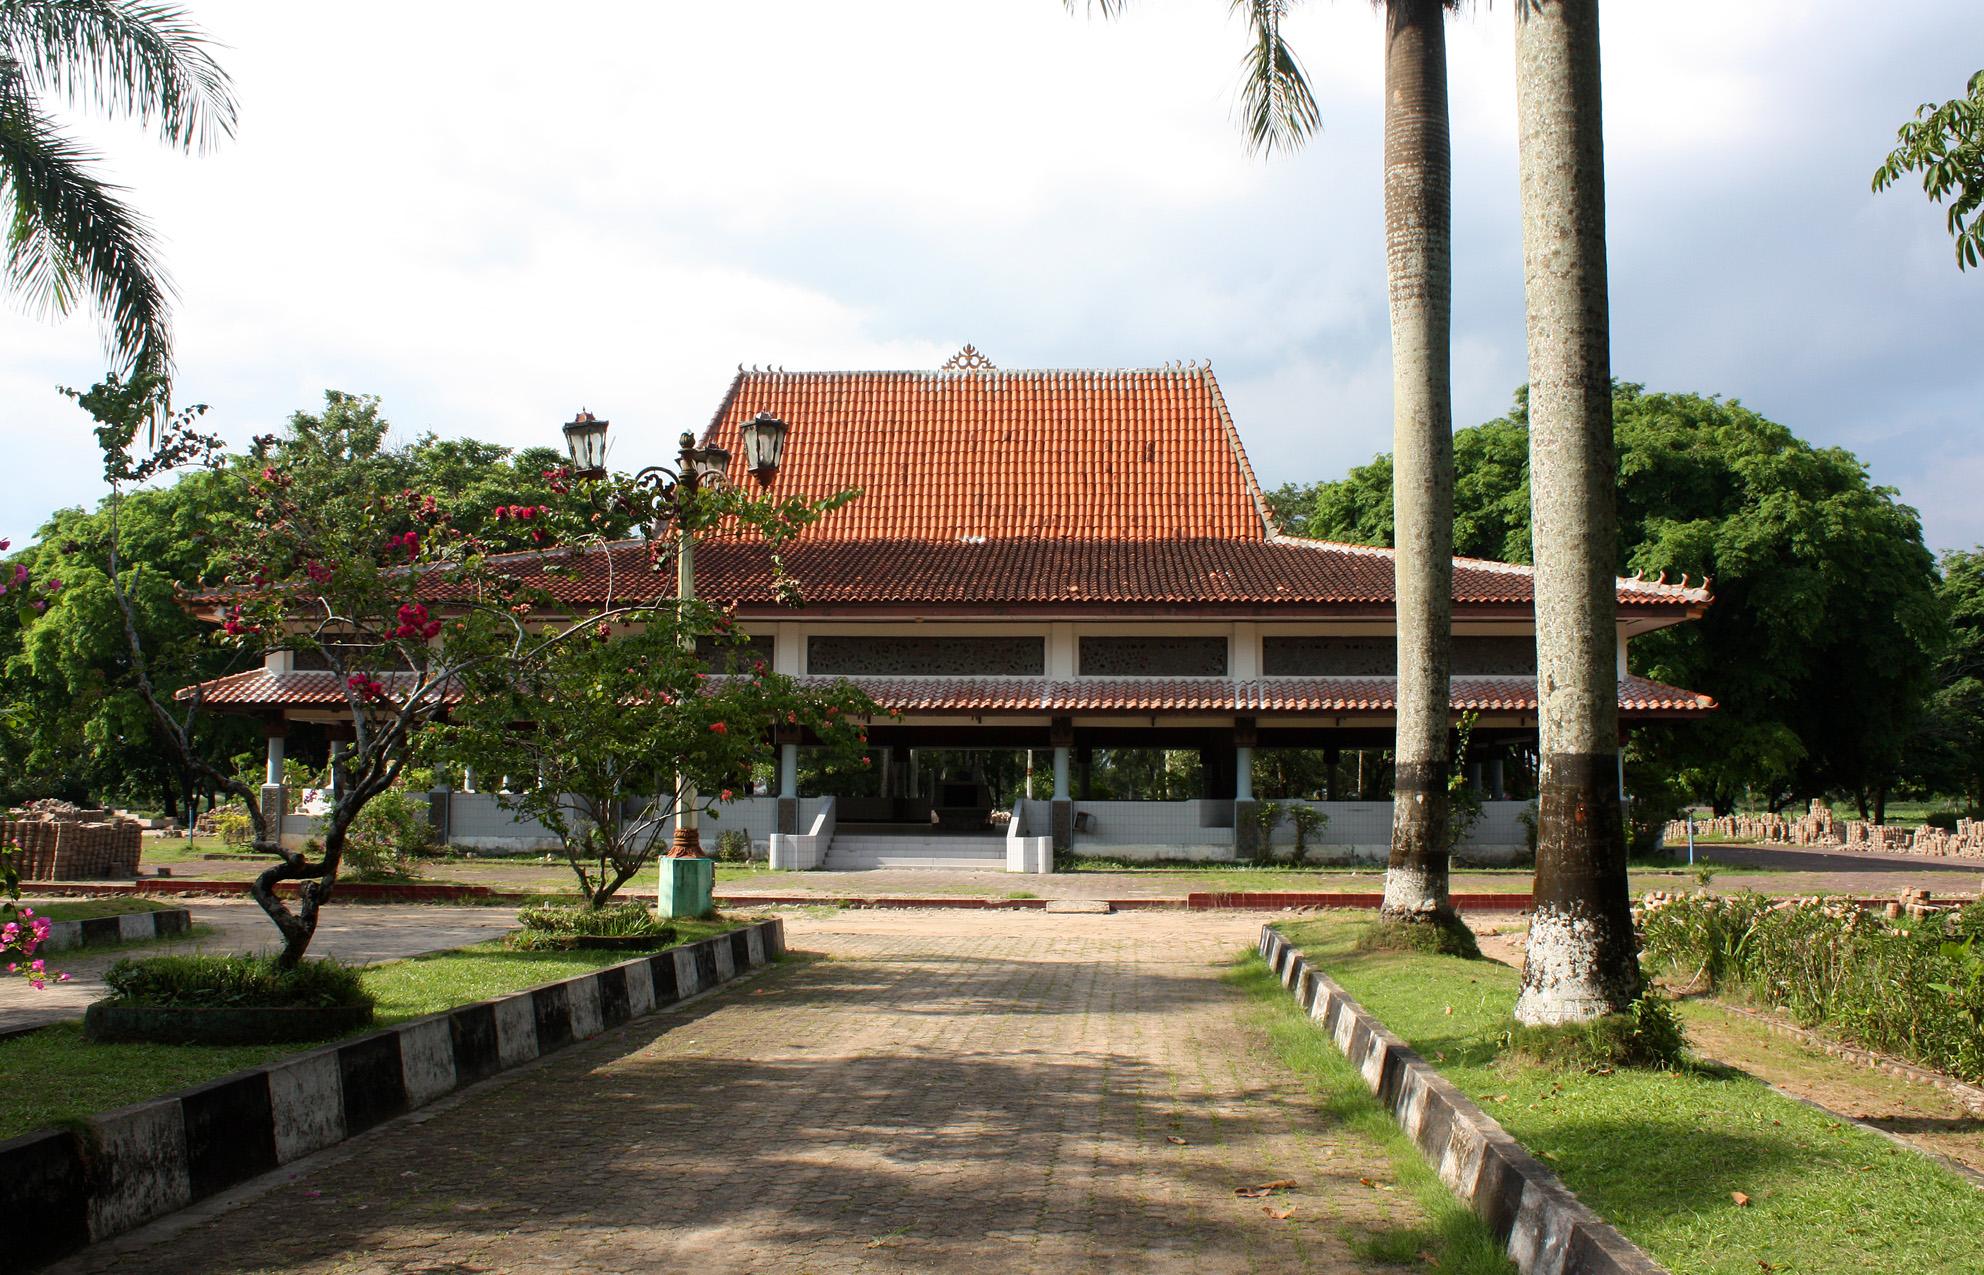 Sriwijaya Kingdom Archaeological Park Wikipedia Balai Pelestarian Peninggalan Purbakala Kota